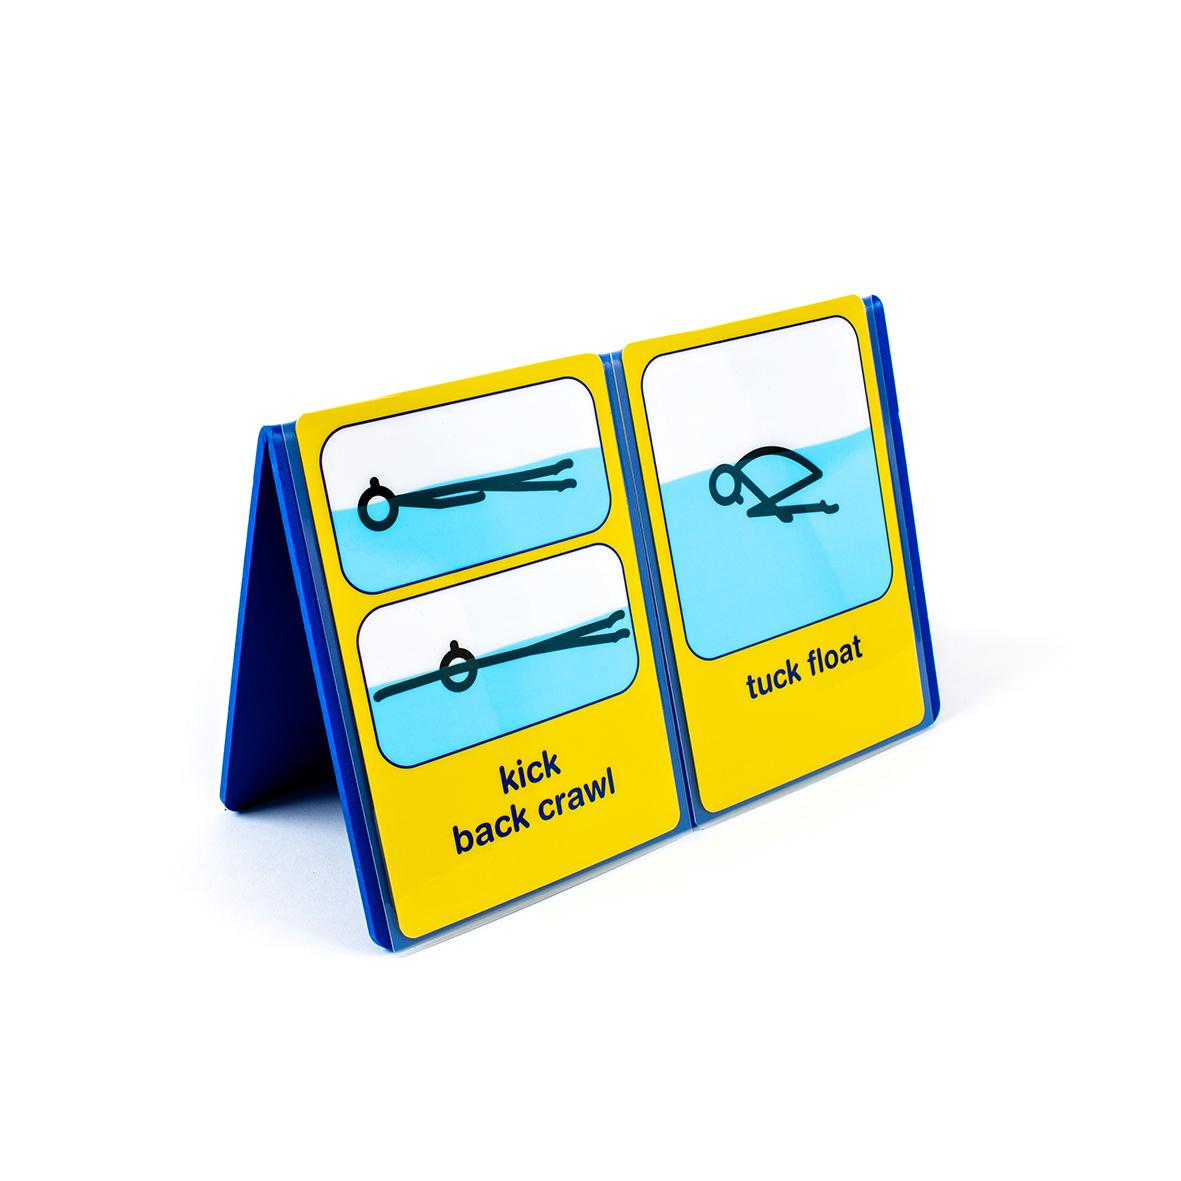 l) StoryBoard - 2 Card